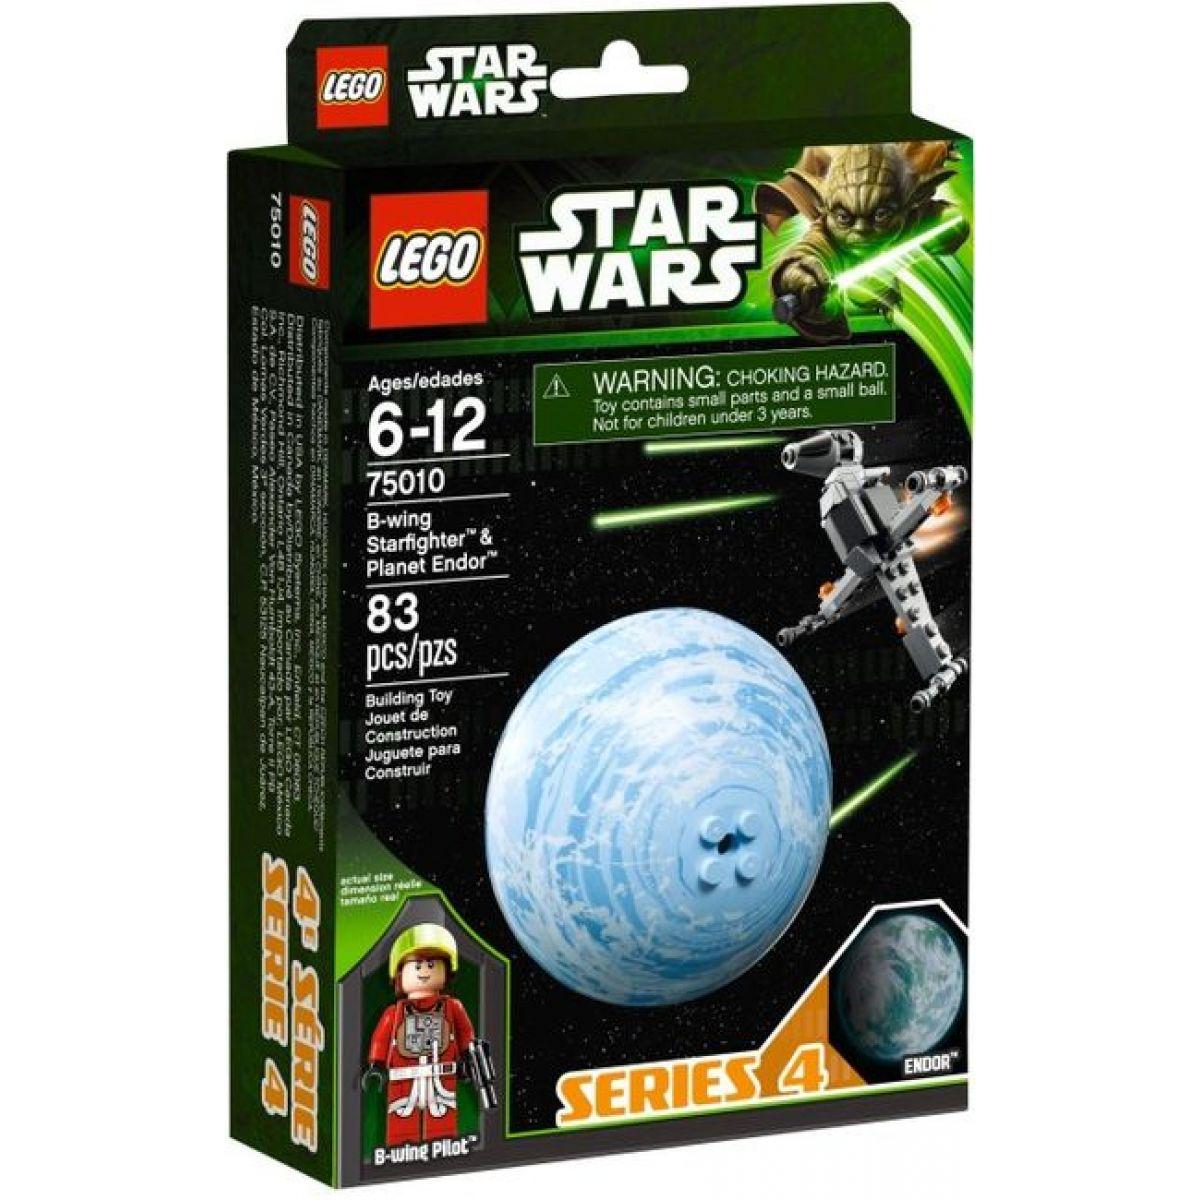 LEGO Star Wars 75010 B-Wing Starfighter & Planet Endor